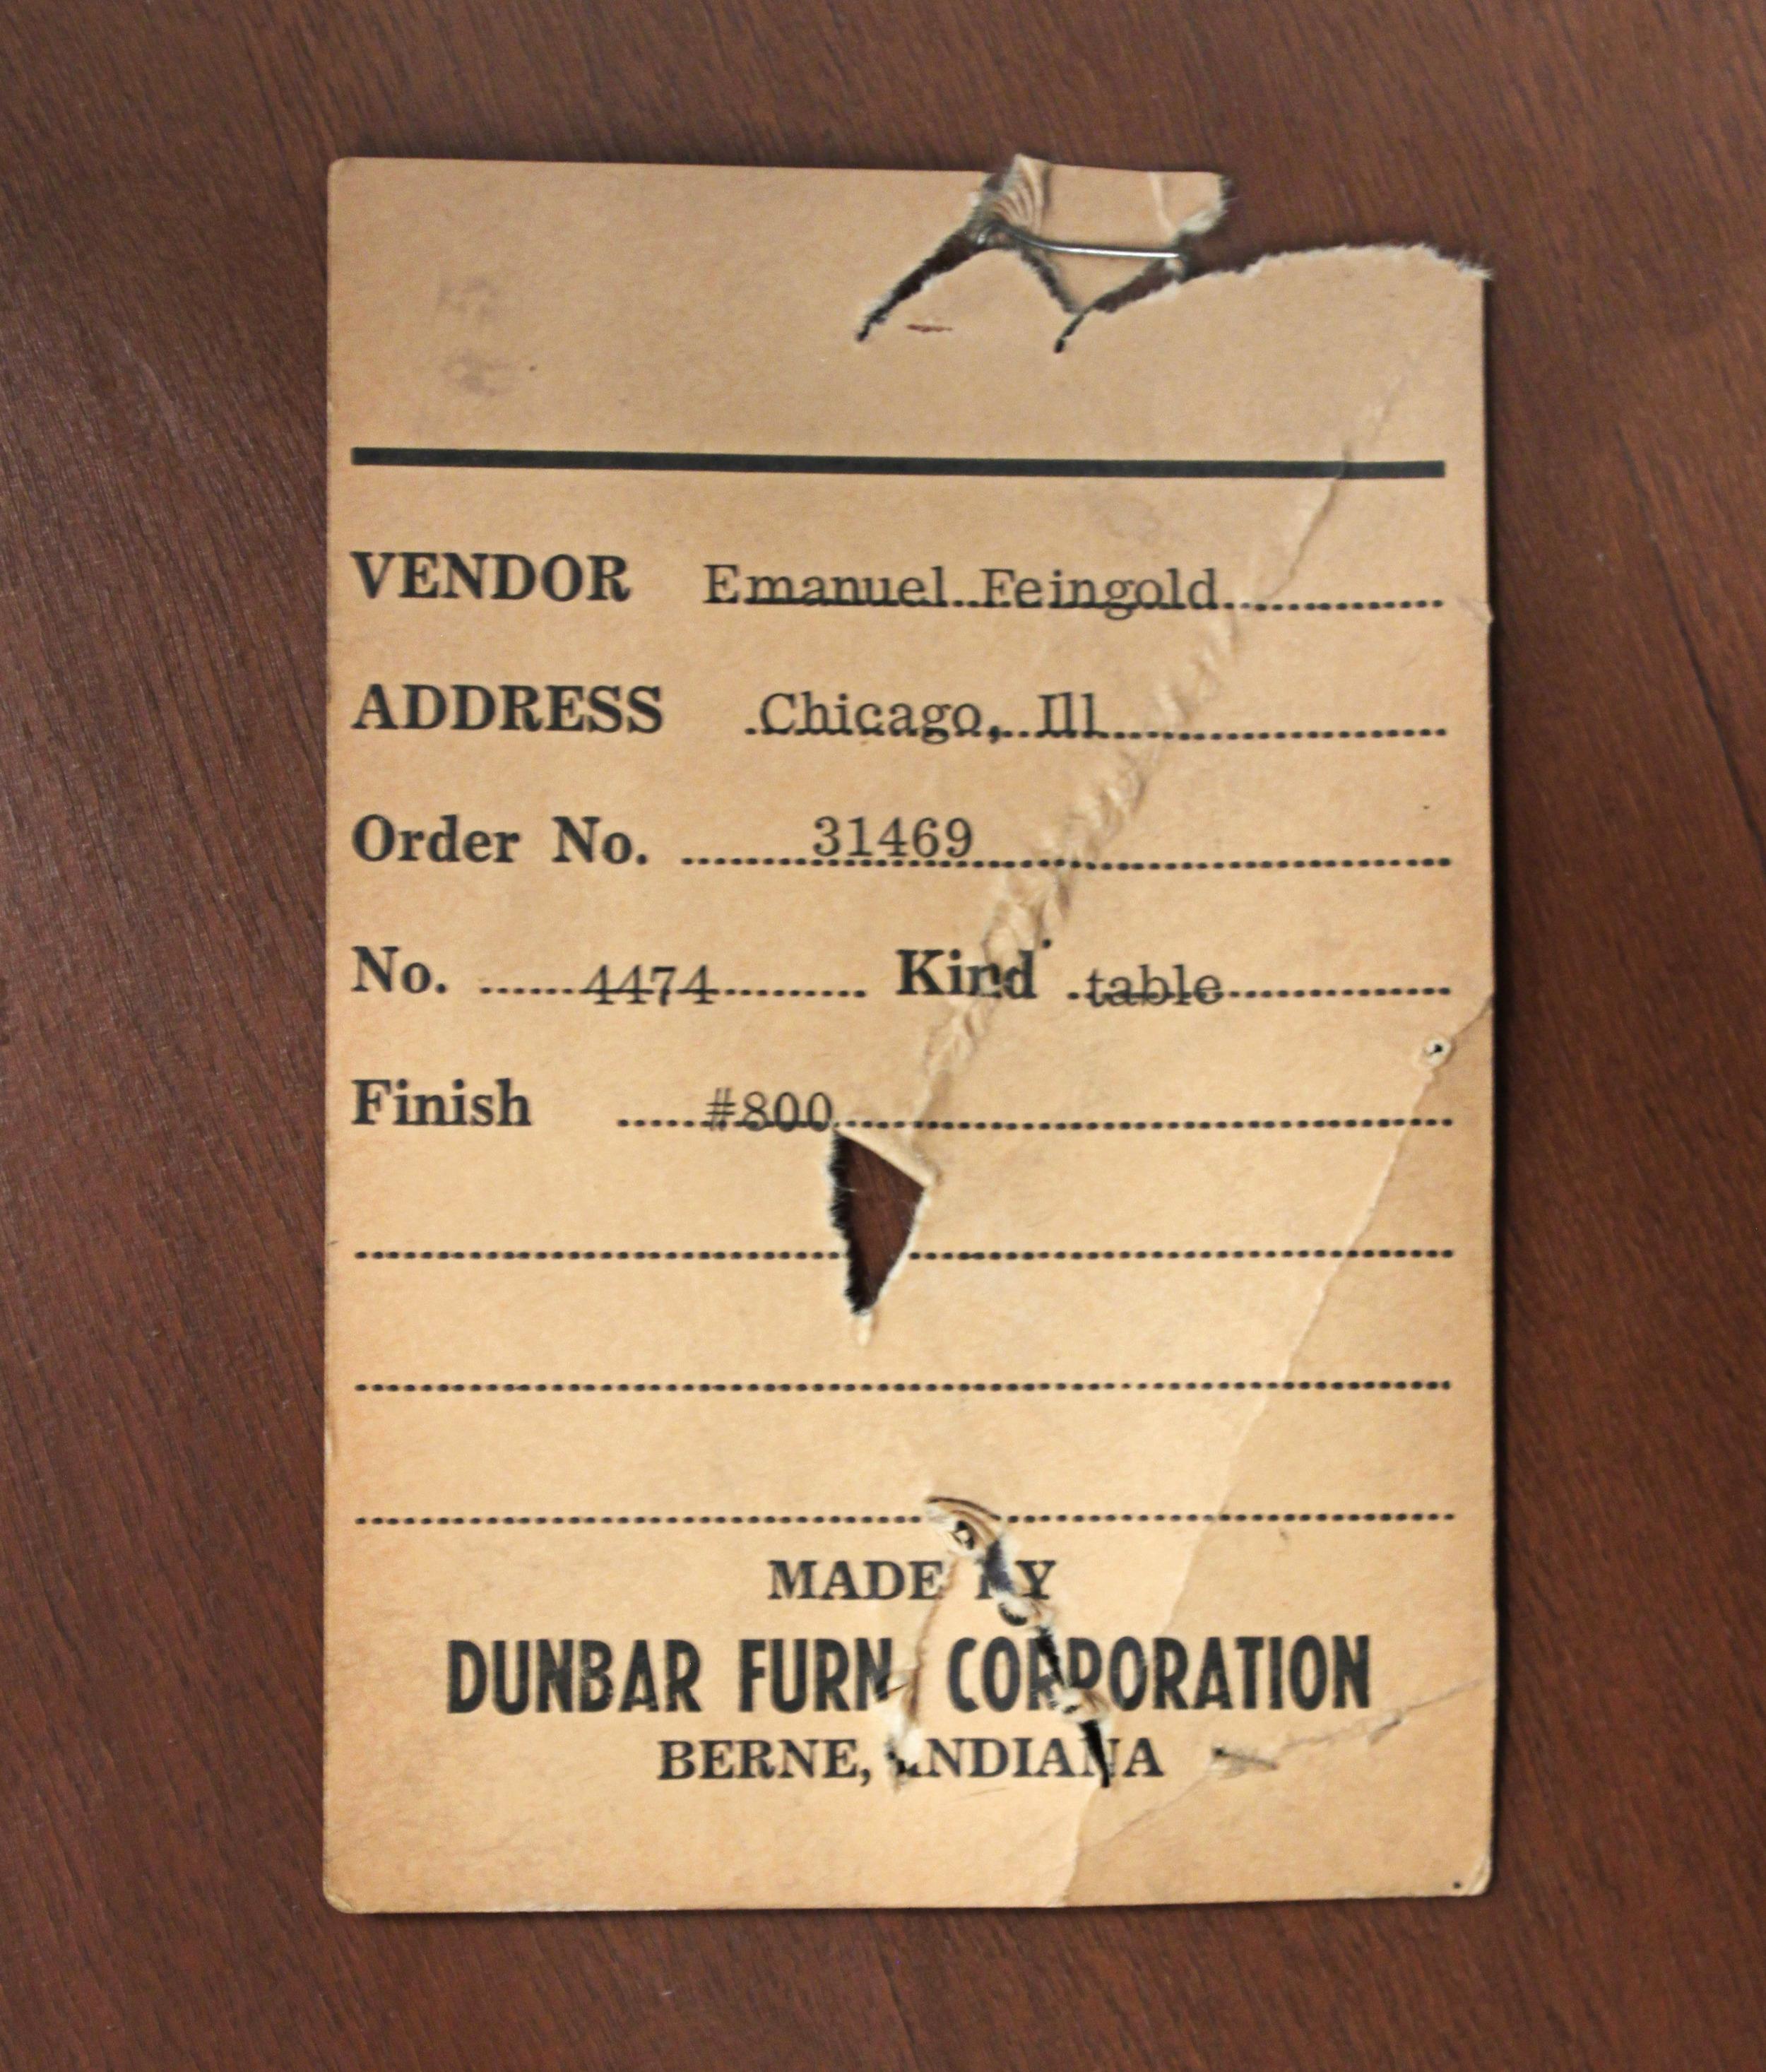 Dunbar 35 walnut parsons table endtable26 detail hires.jpg